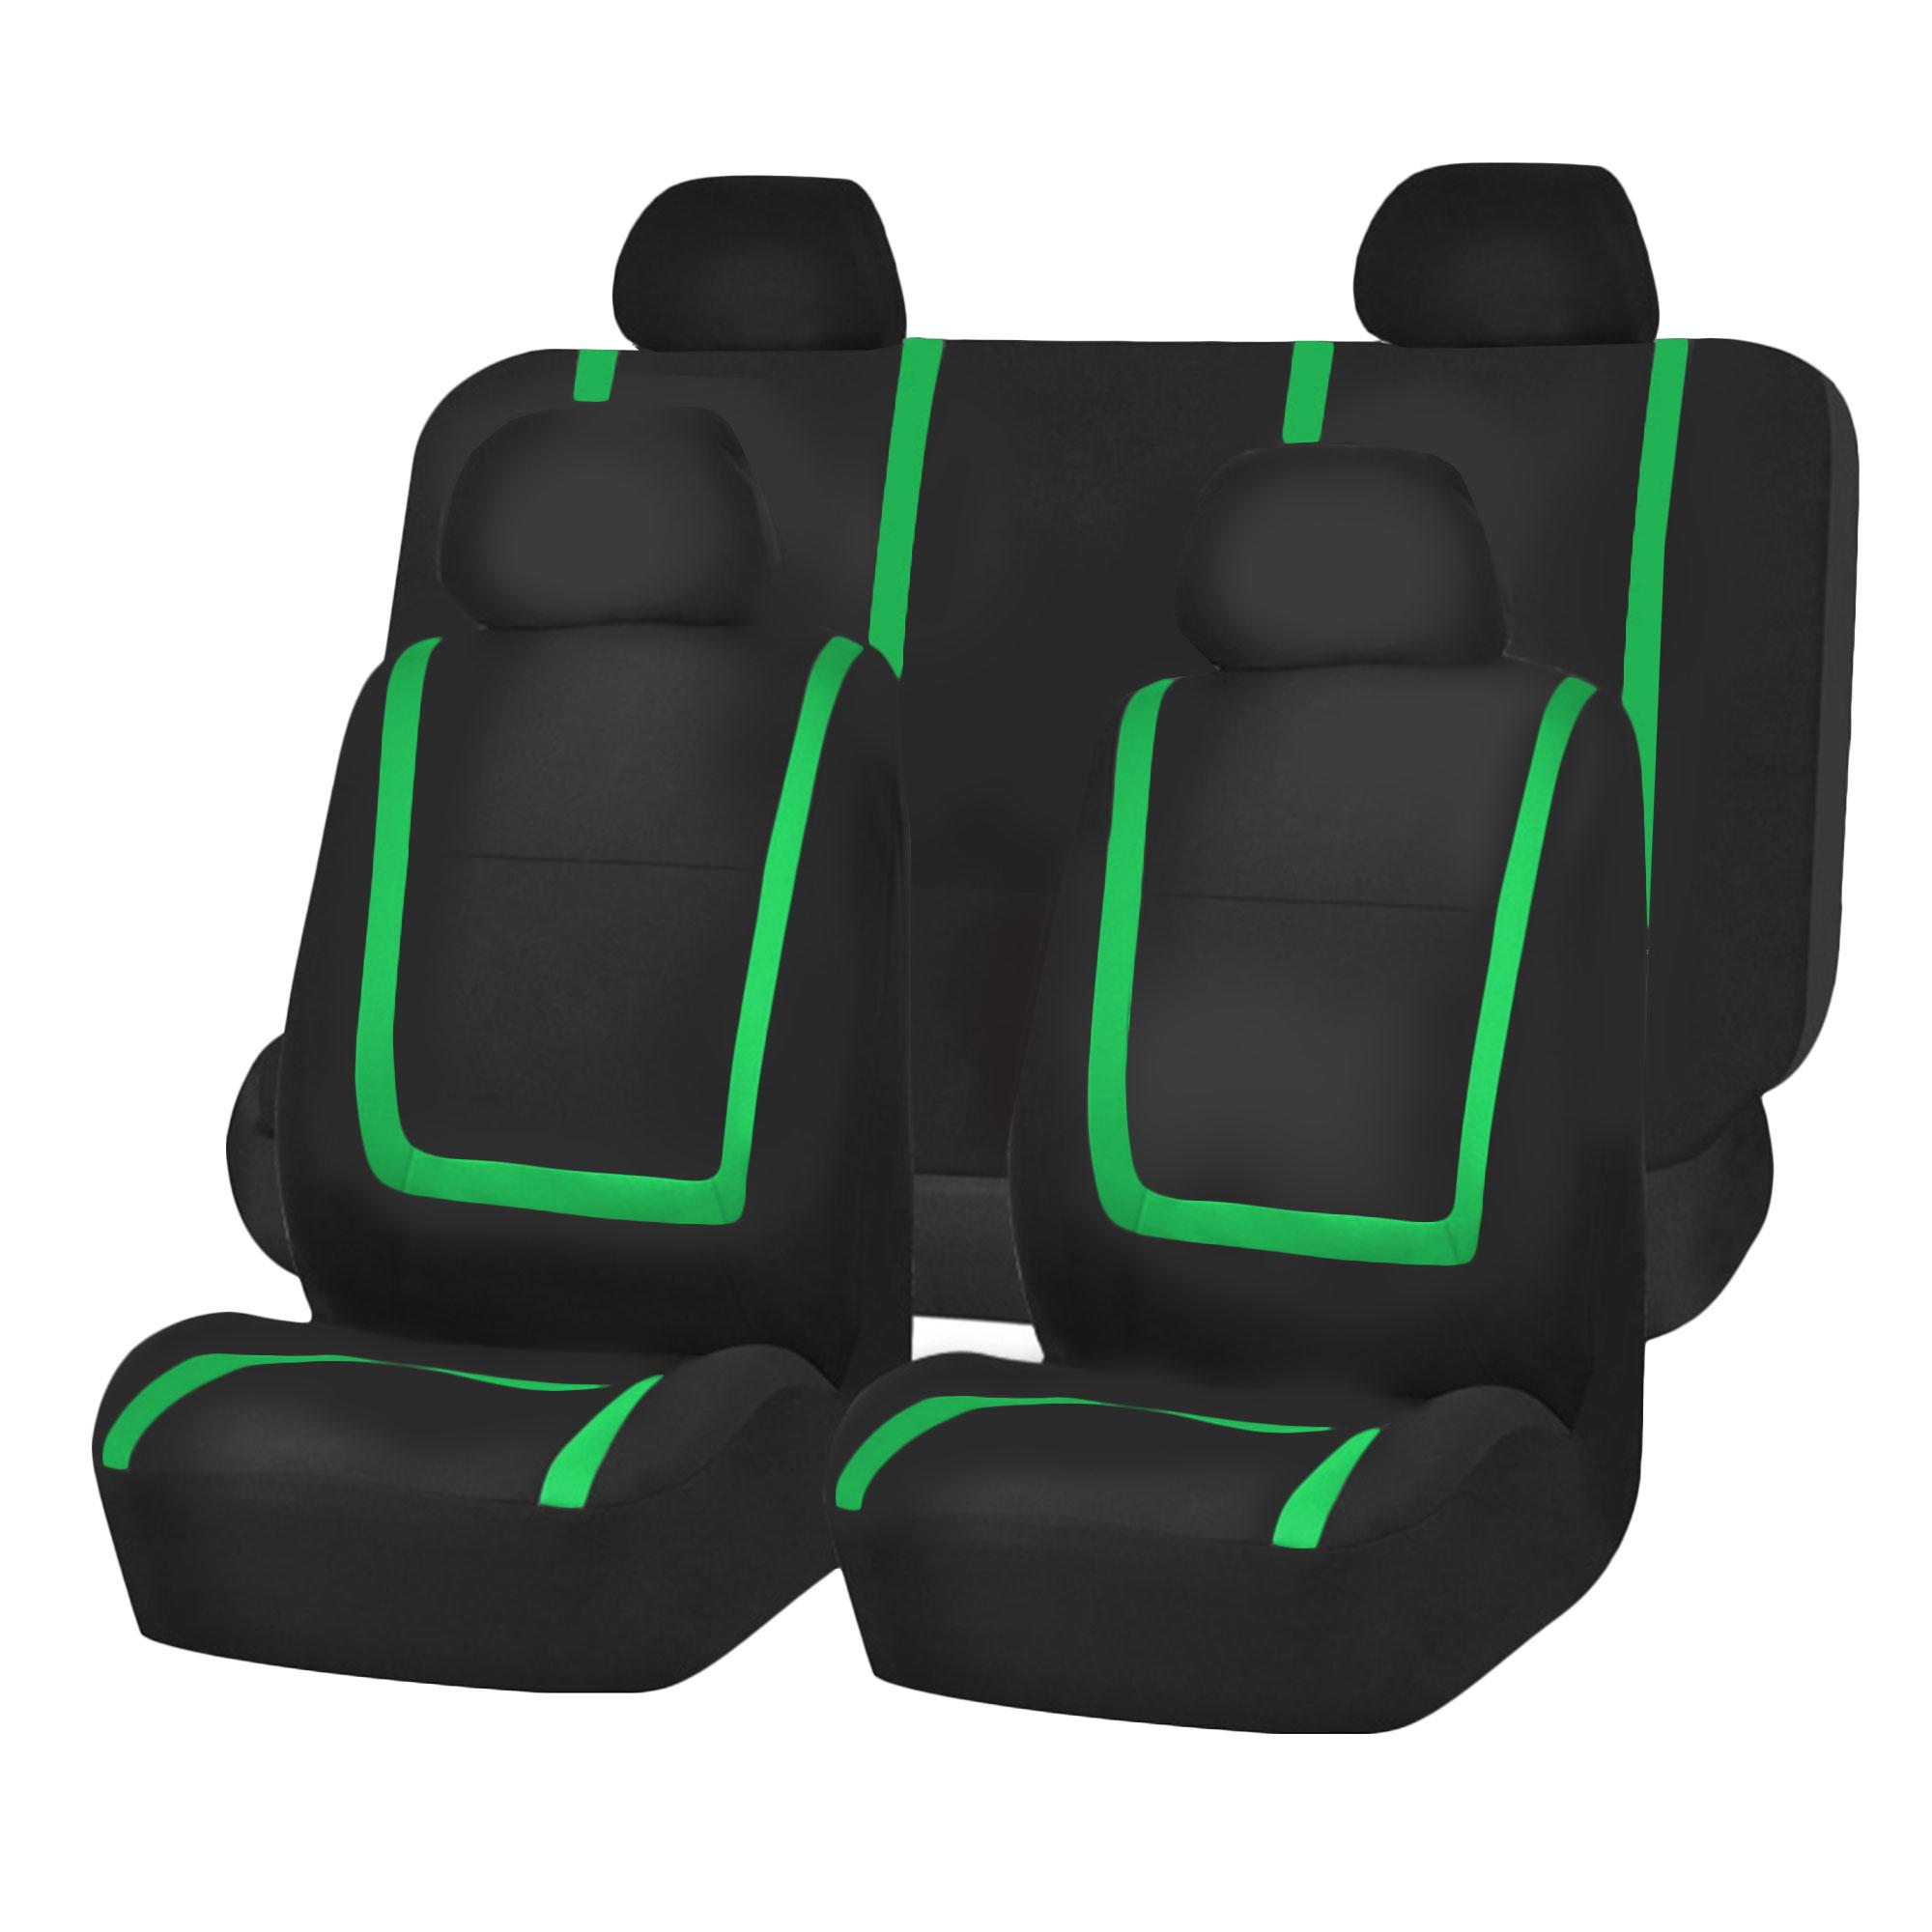 Auto Seat Covers for Car Sedan Truck Van Universal Seat Covers 12 Colors Green